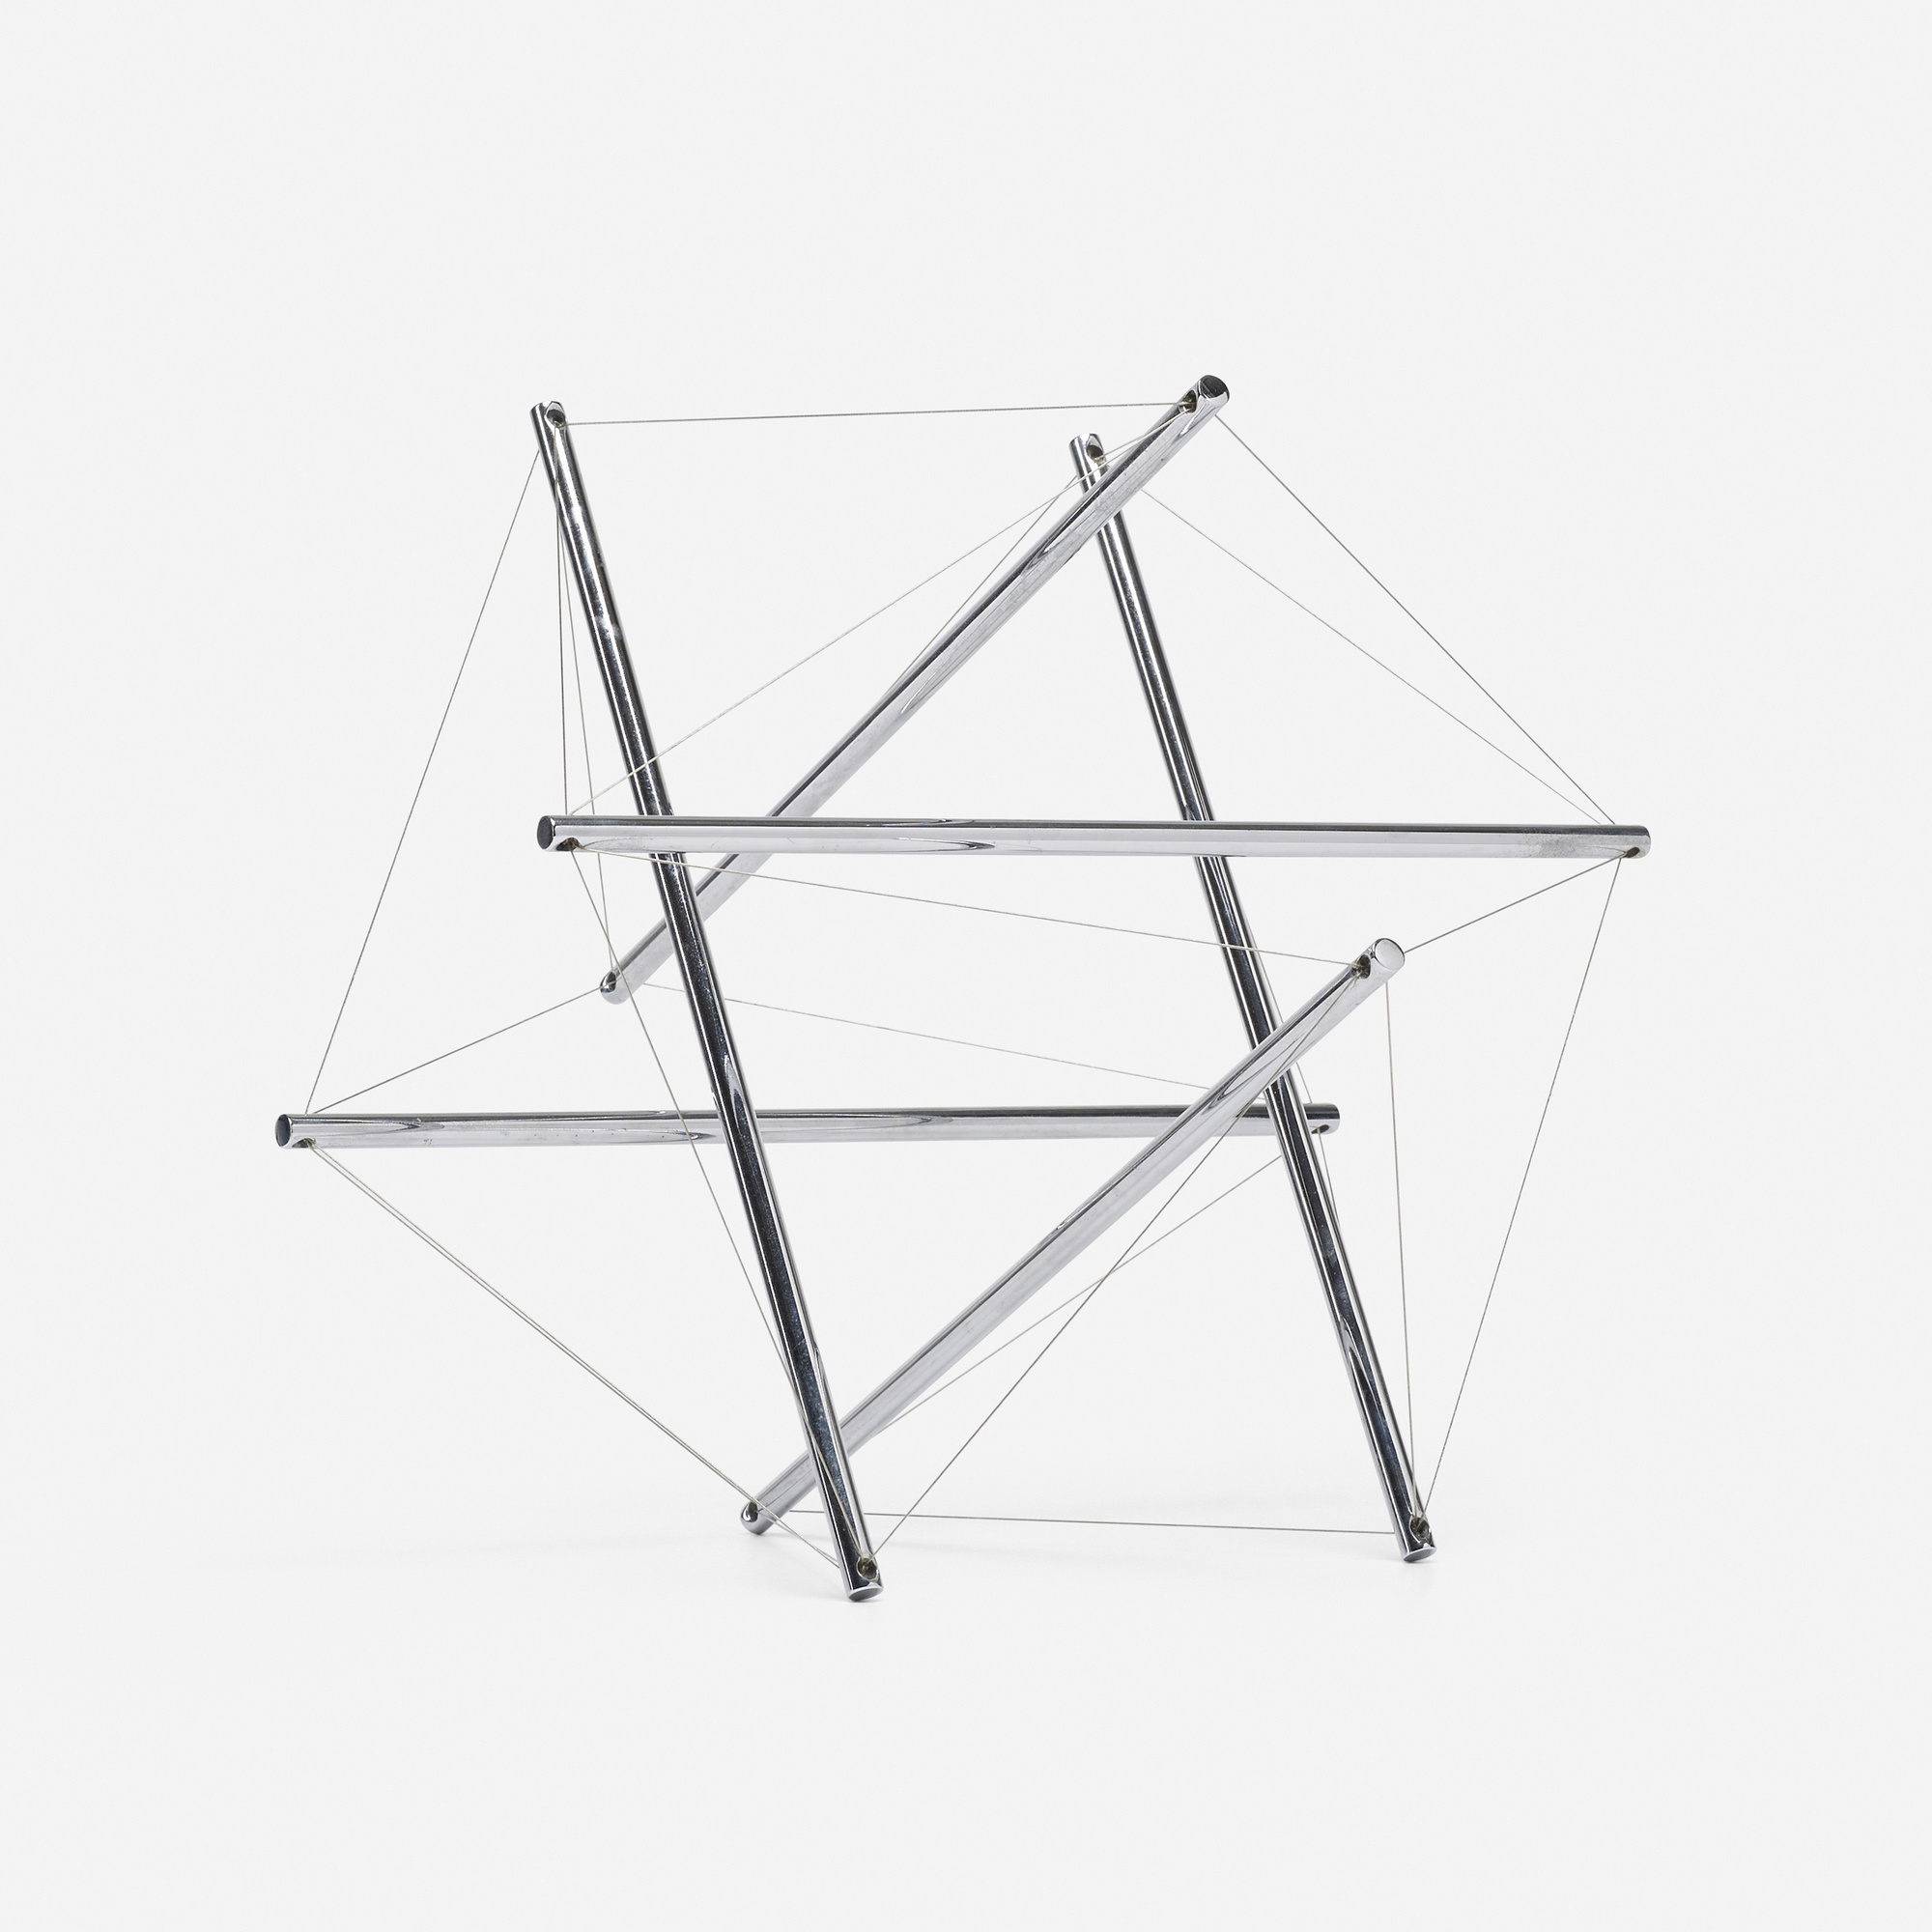 tensegrity furniture. 247: R. Buckminster Fuller / 6-Strut Tensegrity (2 Of 4) Furniture